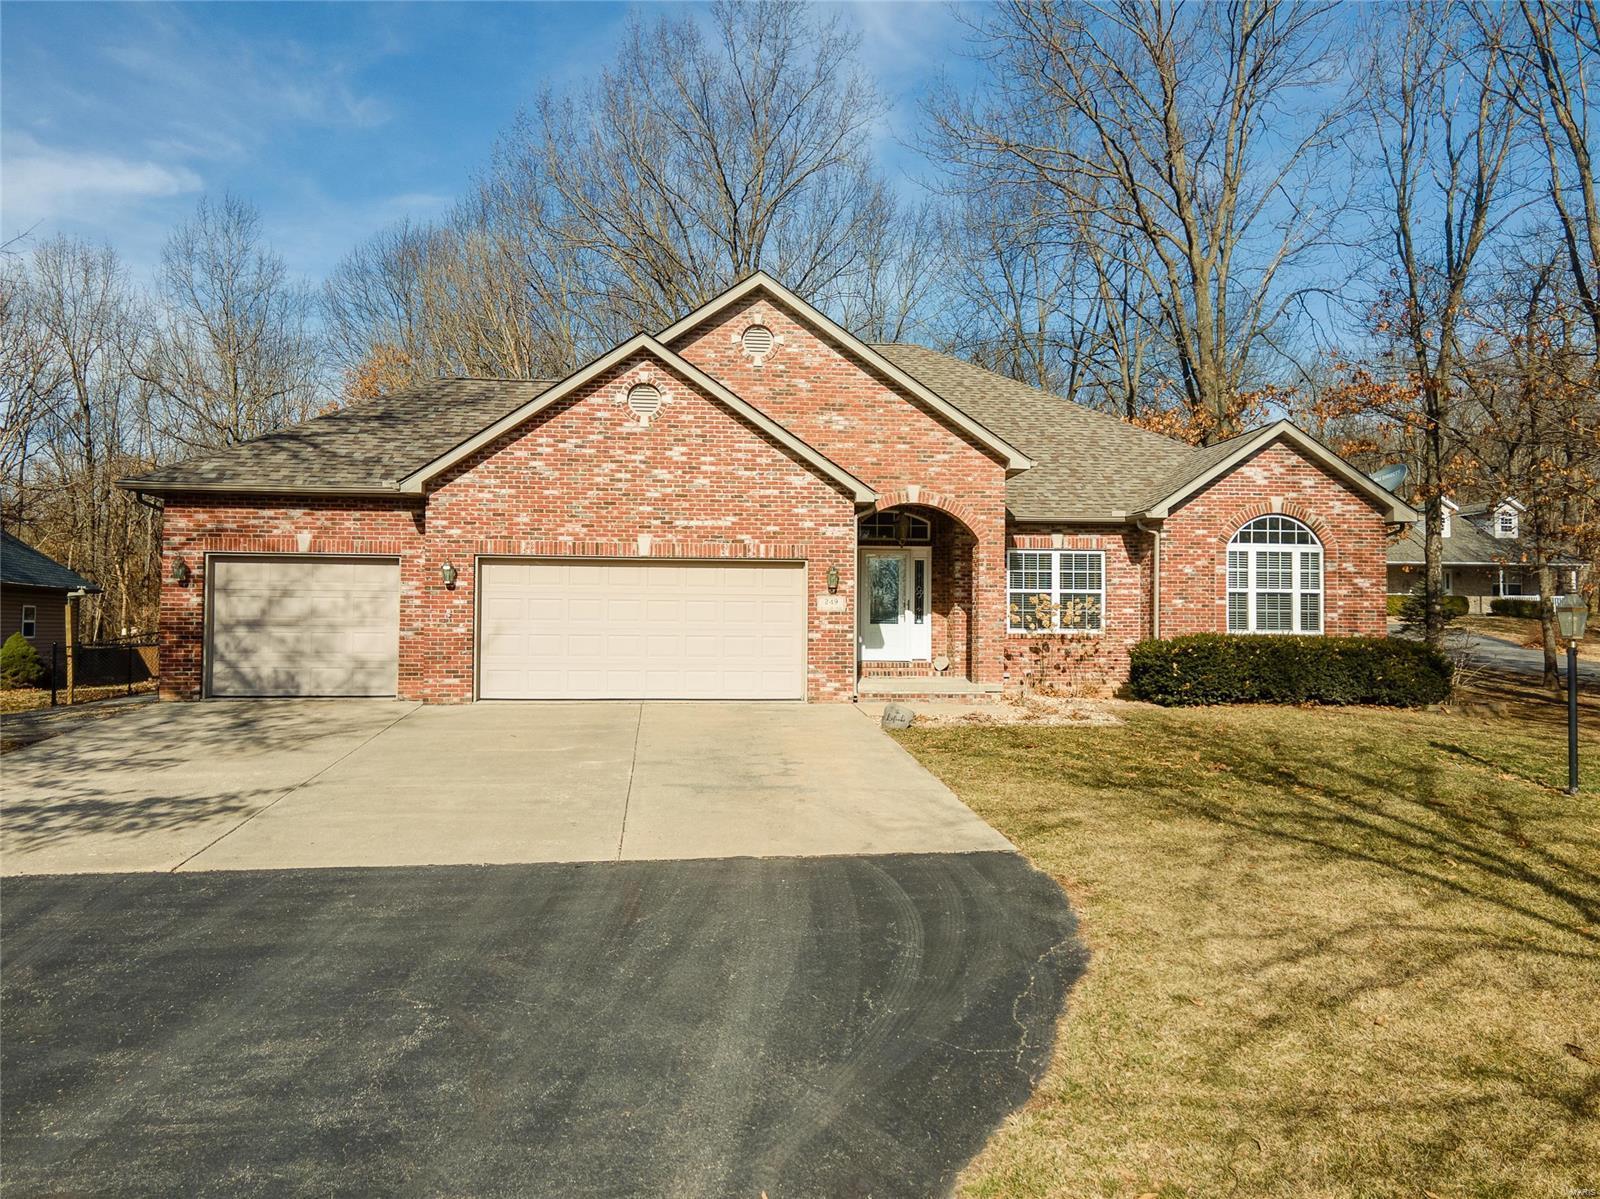 249 Westlake Trail Property Photo - Litchfield, IL real estate listing